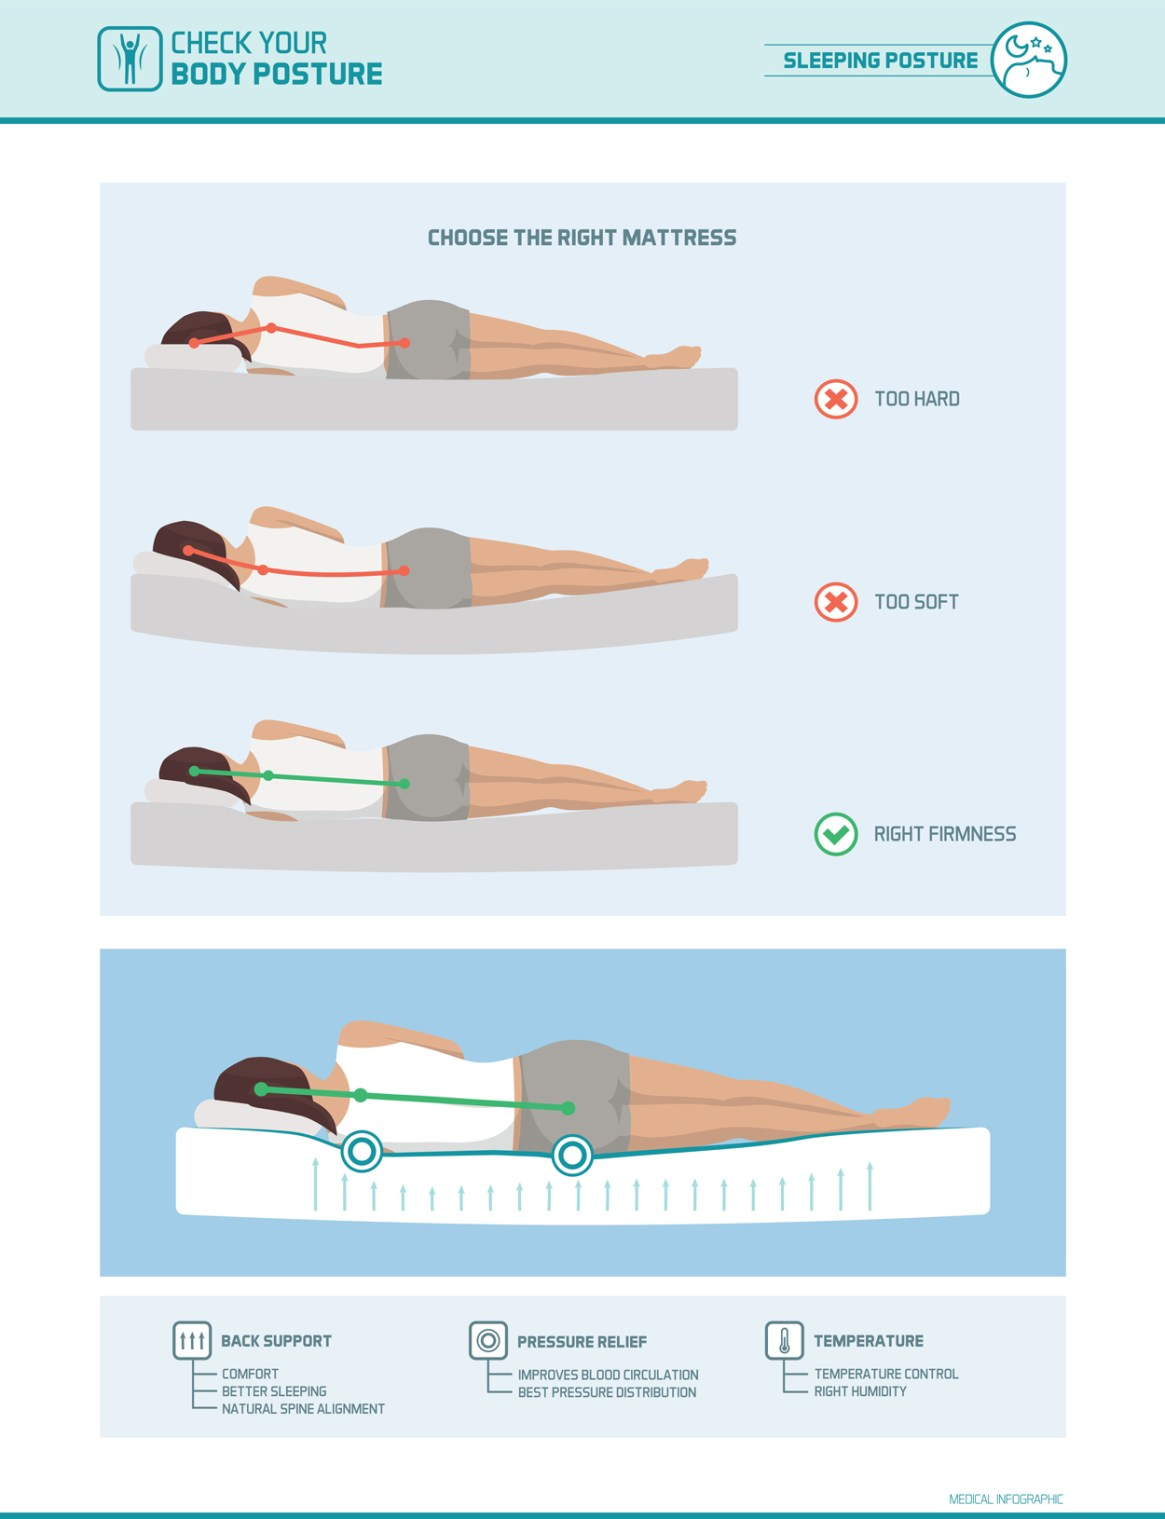 The Correct Sleeping Posture